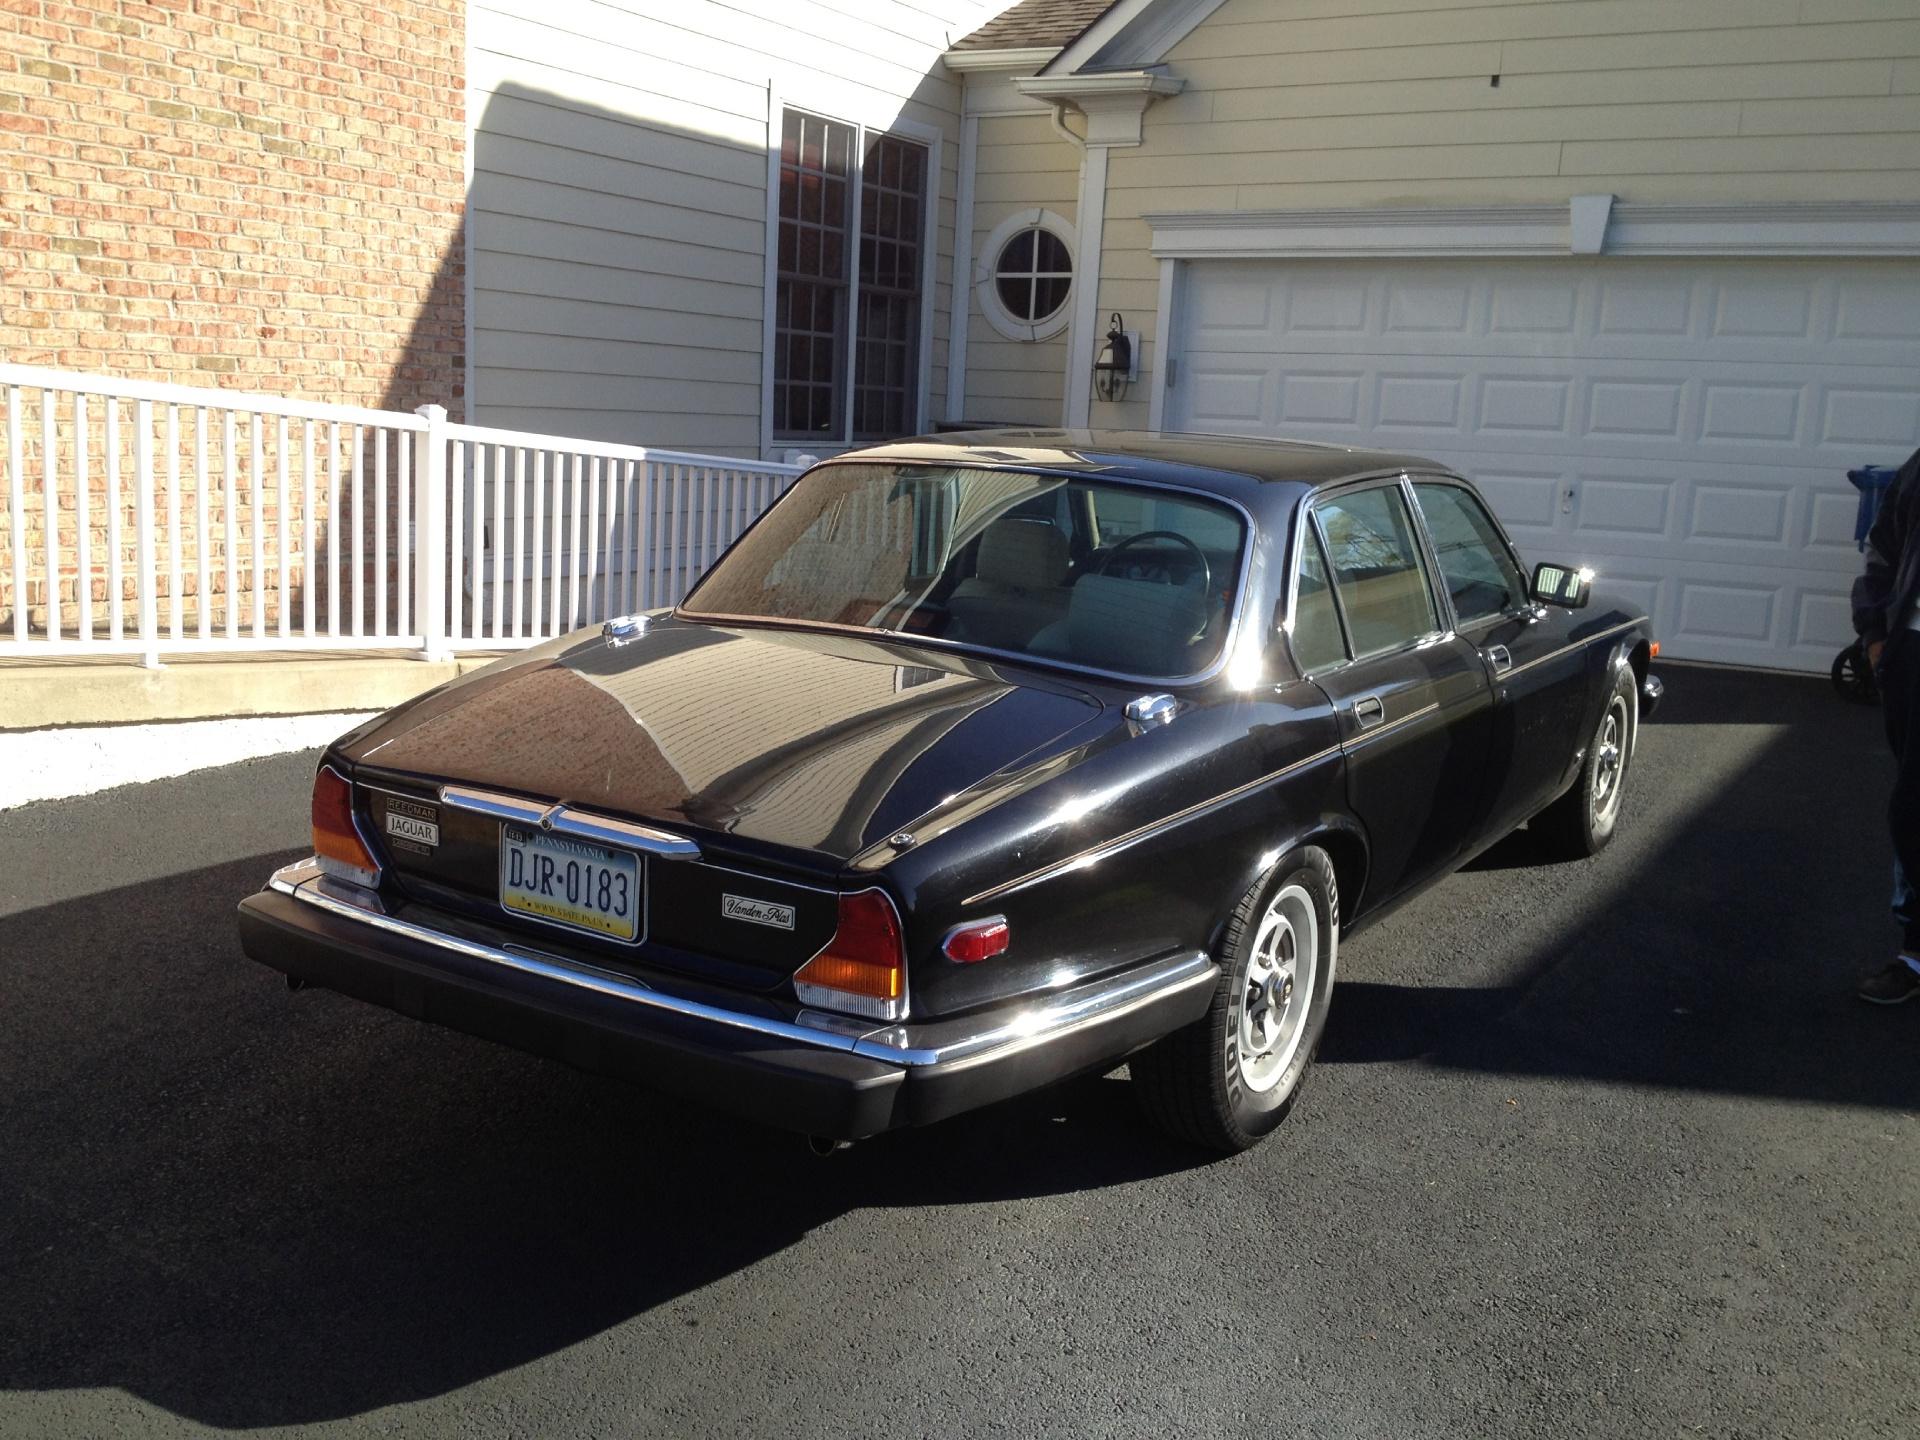 1987 Jaguar XJ6 Vanden Plas Stock # BLACKXJ12 for sale ...